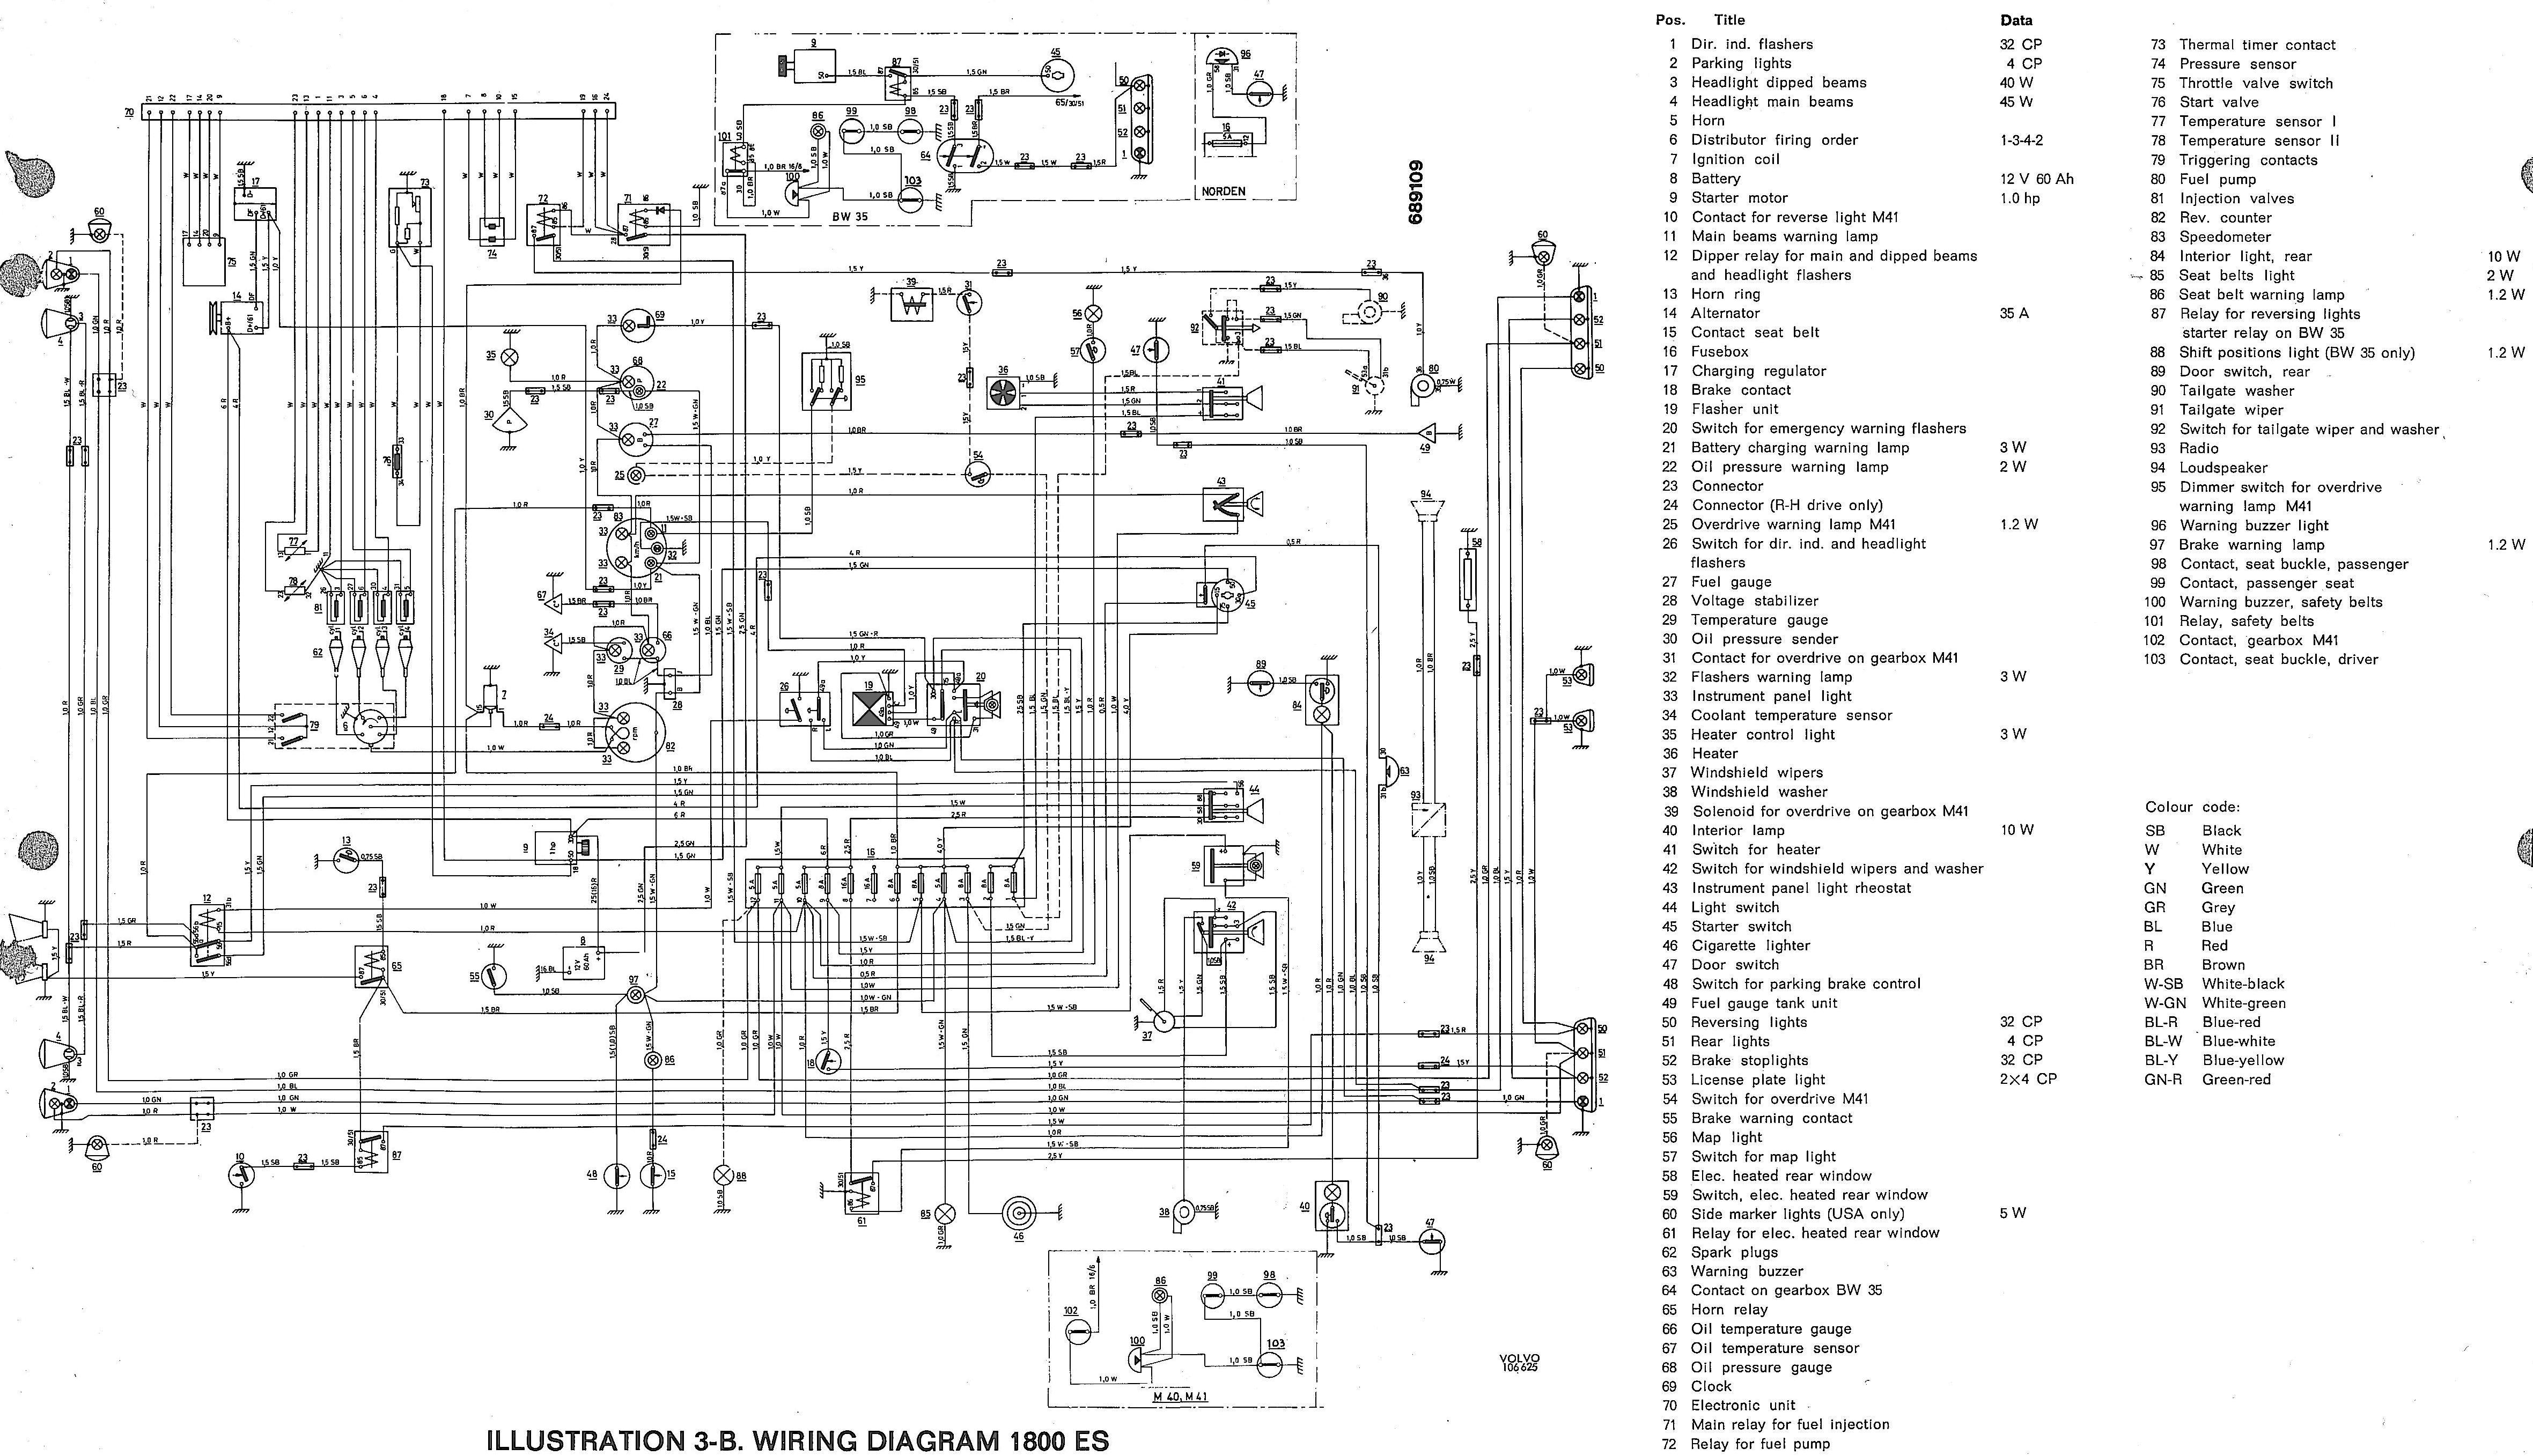 volvo 850 radio wiring harness diagram ar 5197  volvo 1800es wiring diagram  ar 5197  volvo 1800es wiring diagram